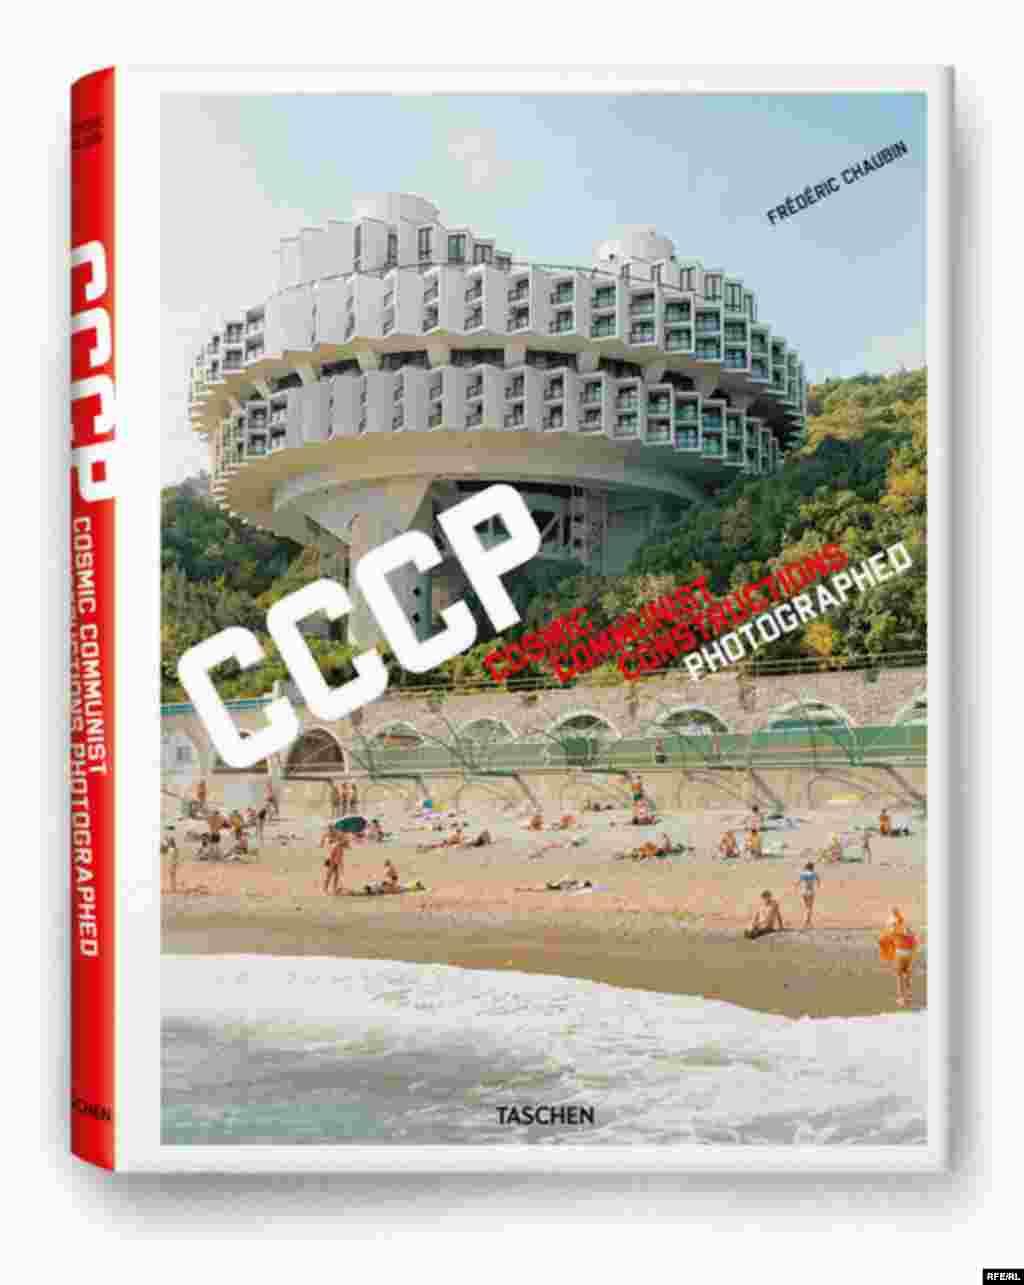 Cosmic Communist Constructions #7